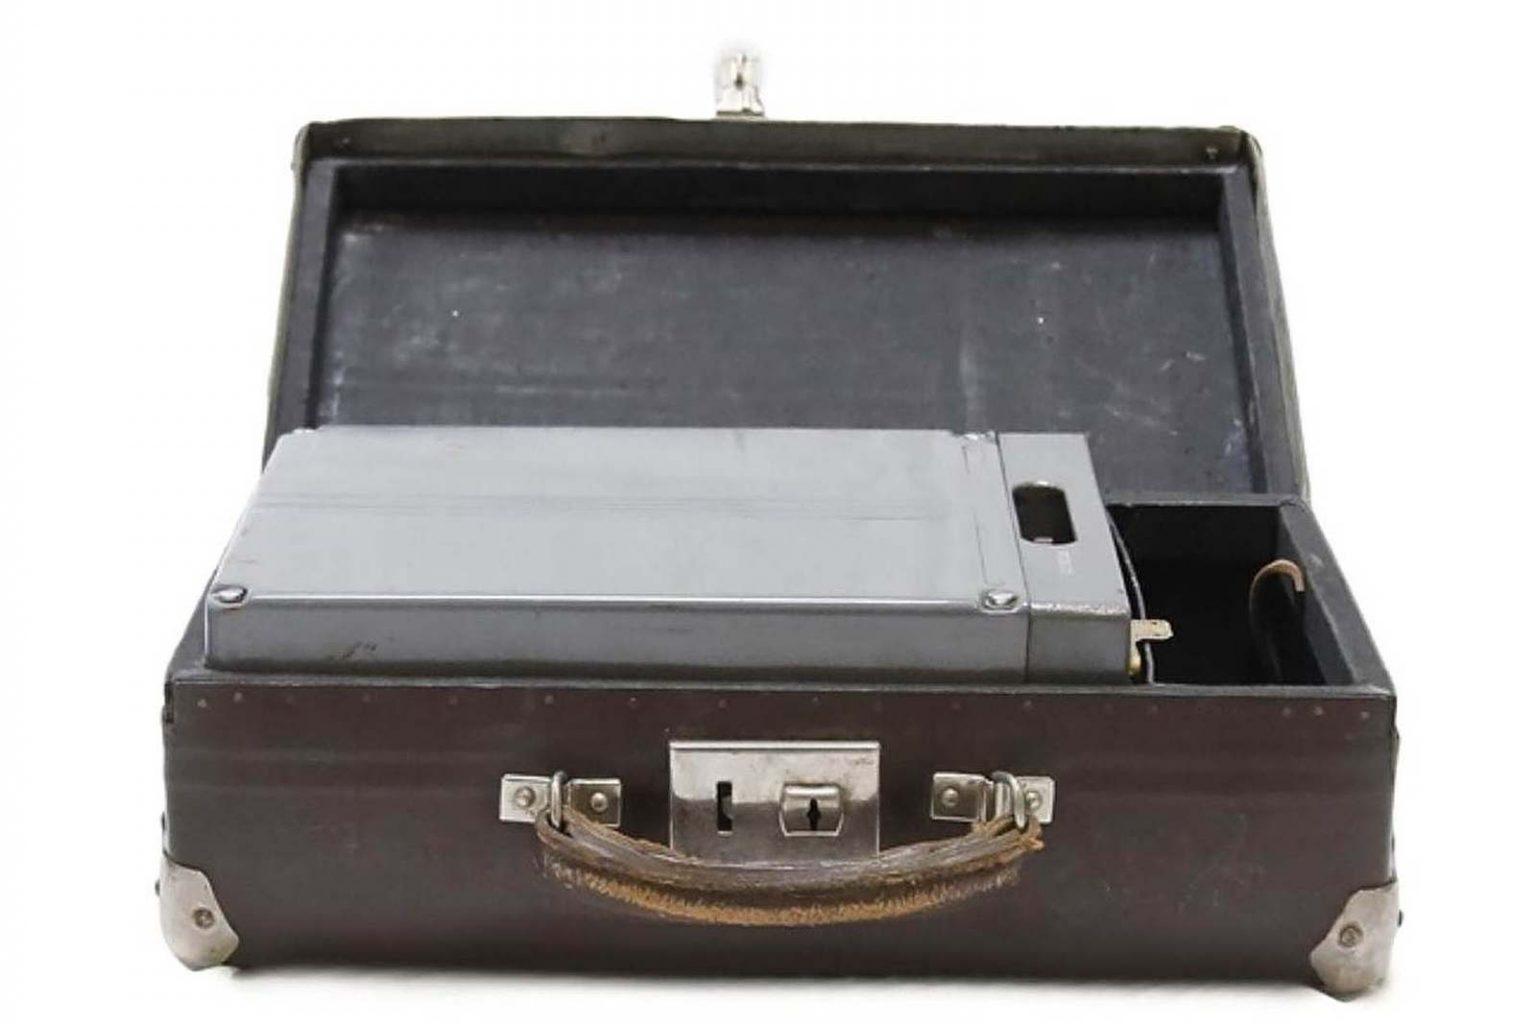 expo-kgb-valise-batterie-radio-p57